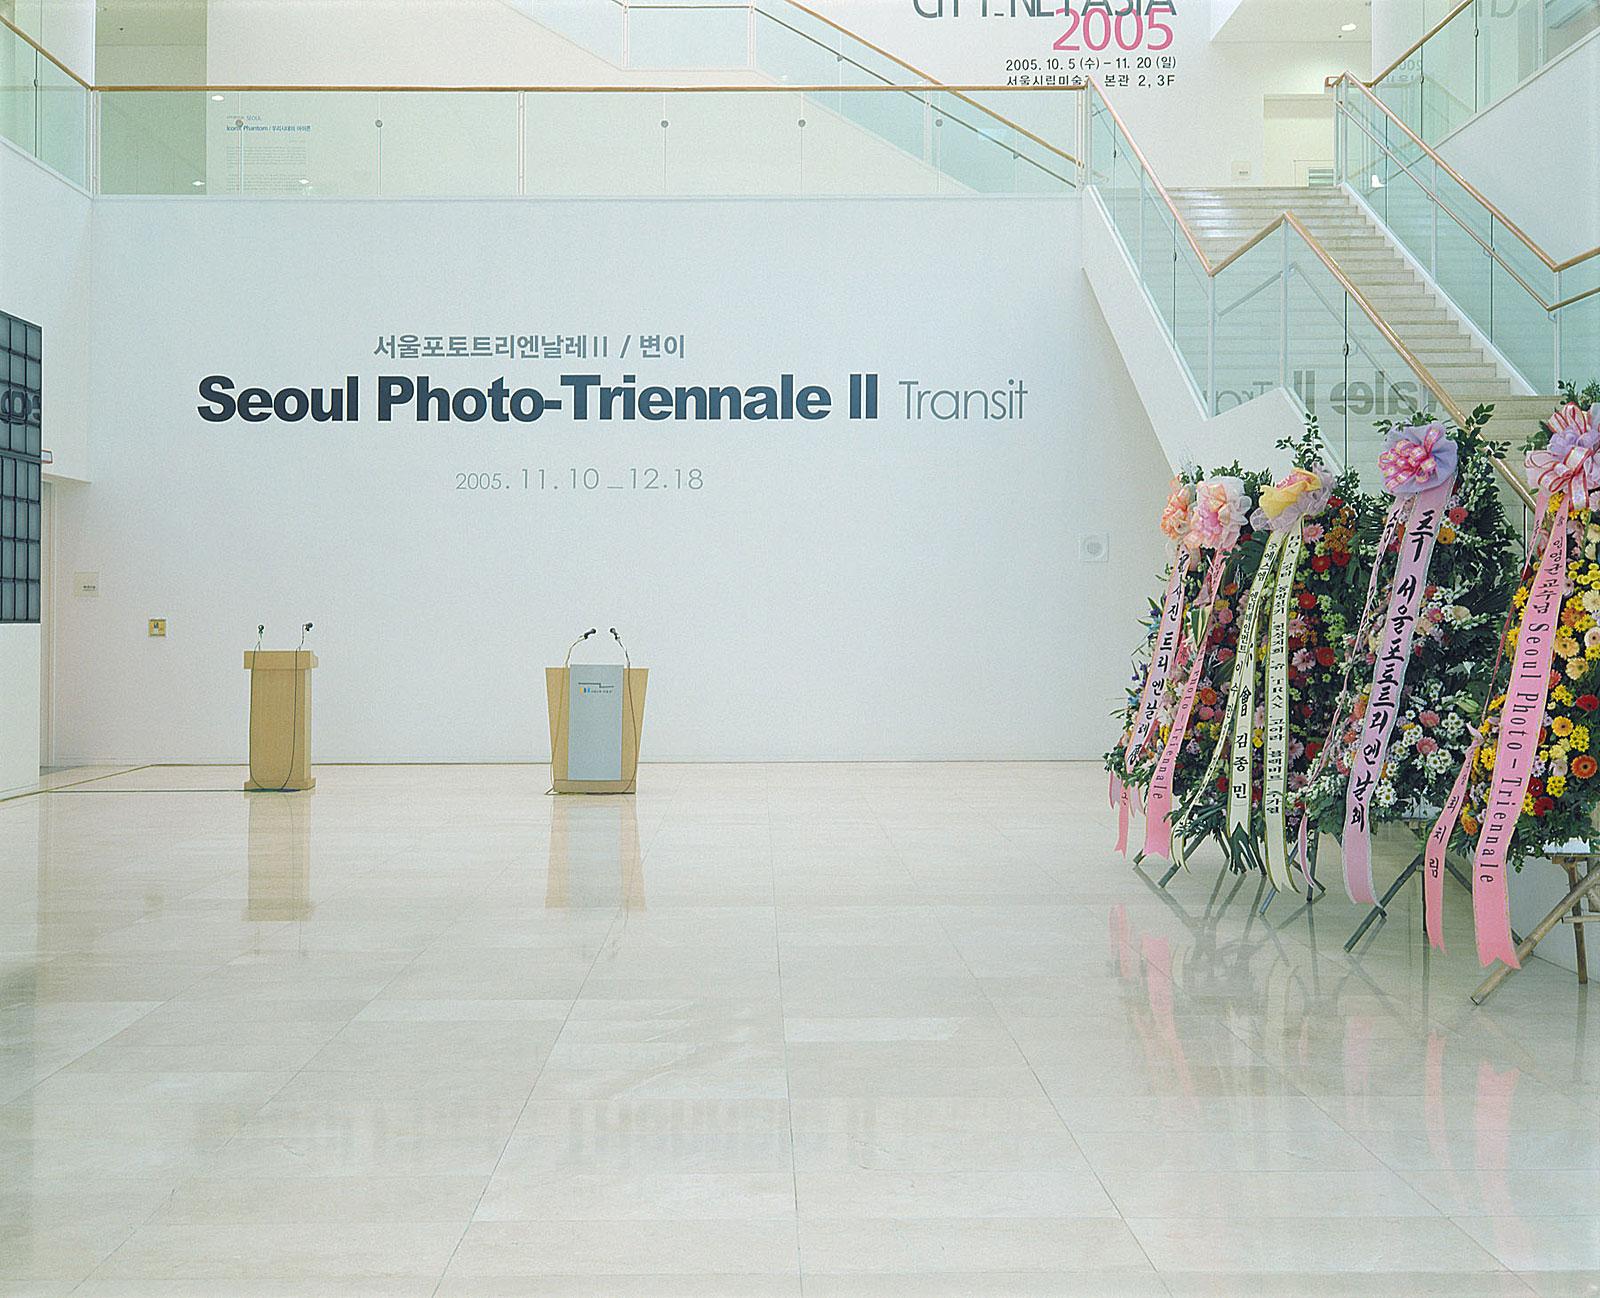 Photo Triennale Seoul (9.11.2005)